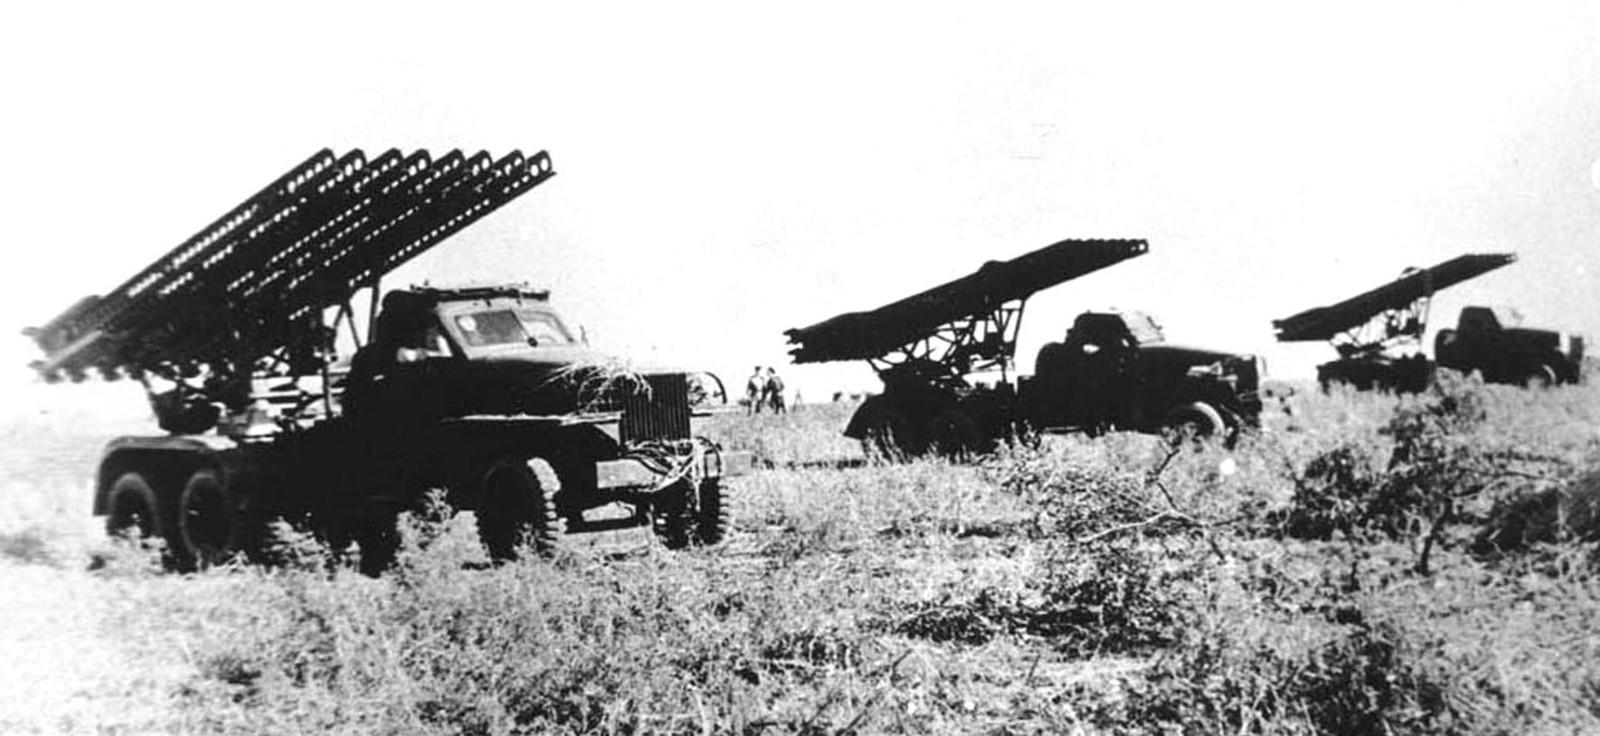 Дивизион боевых машин БМ-13 на автомобилях Studebaker US6-U7